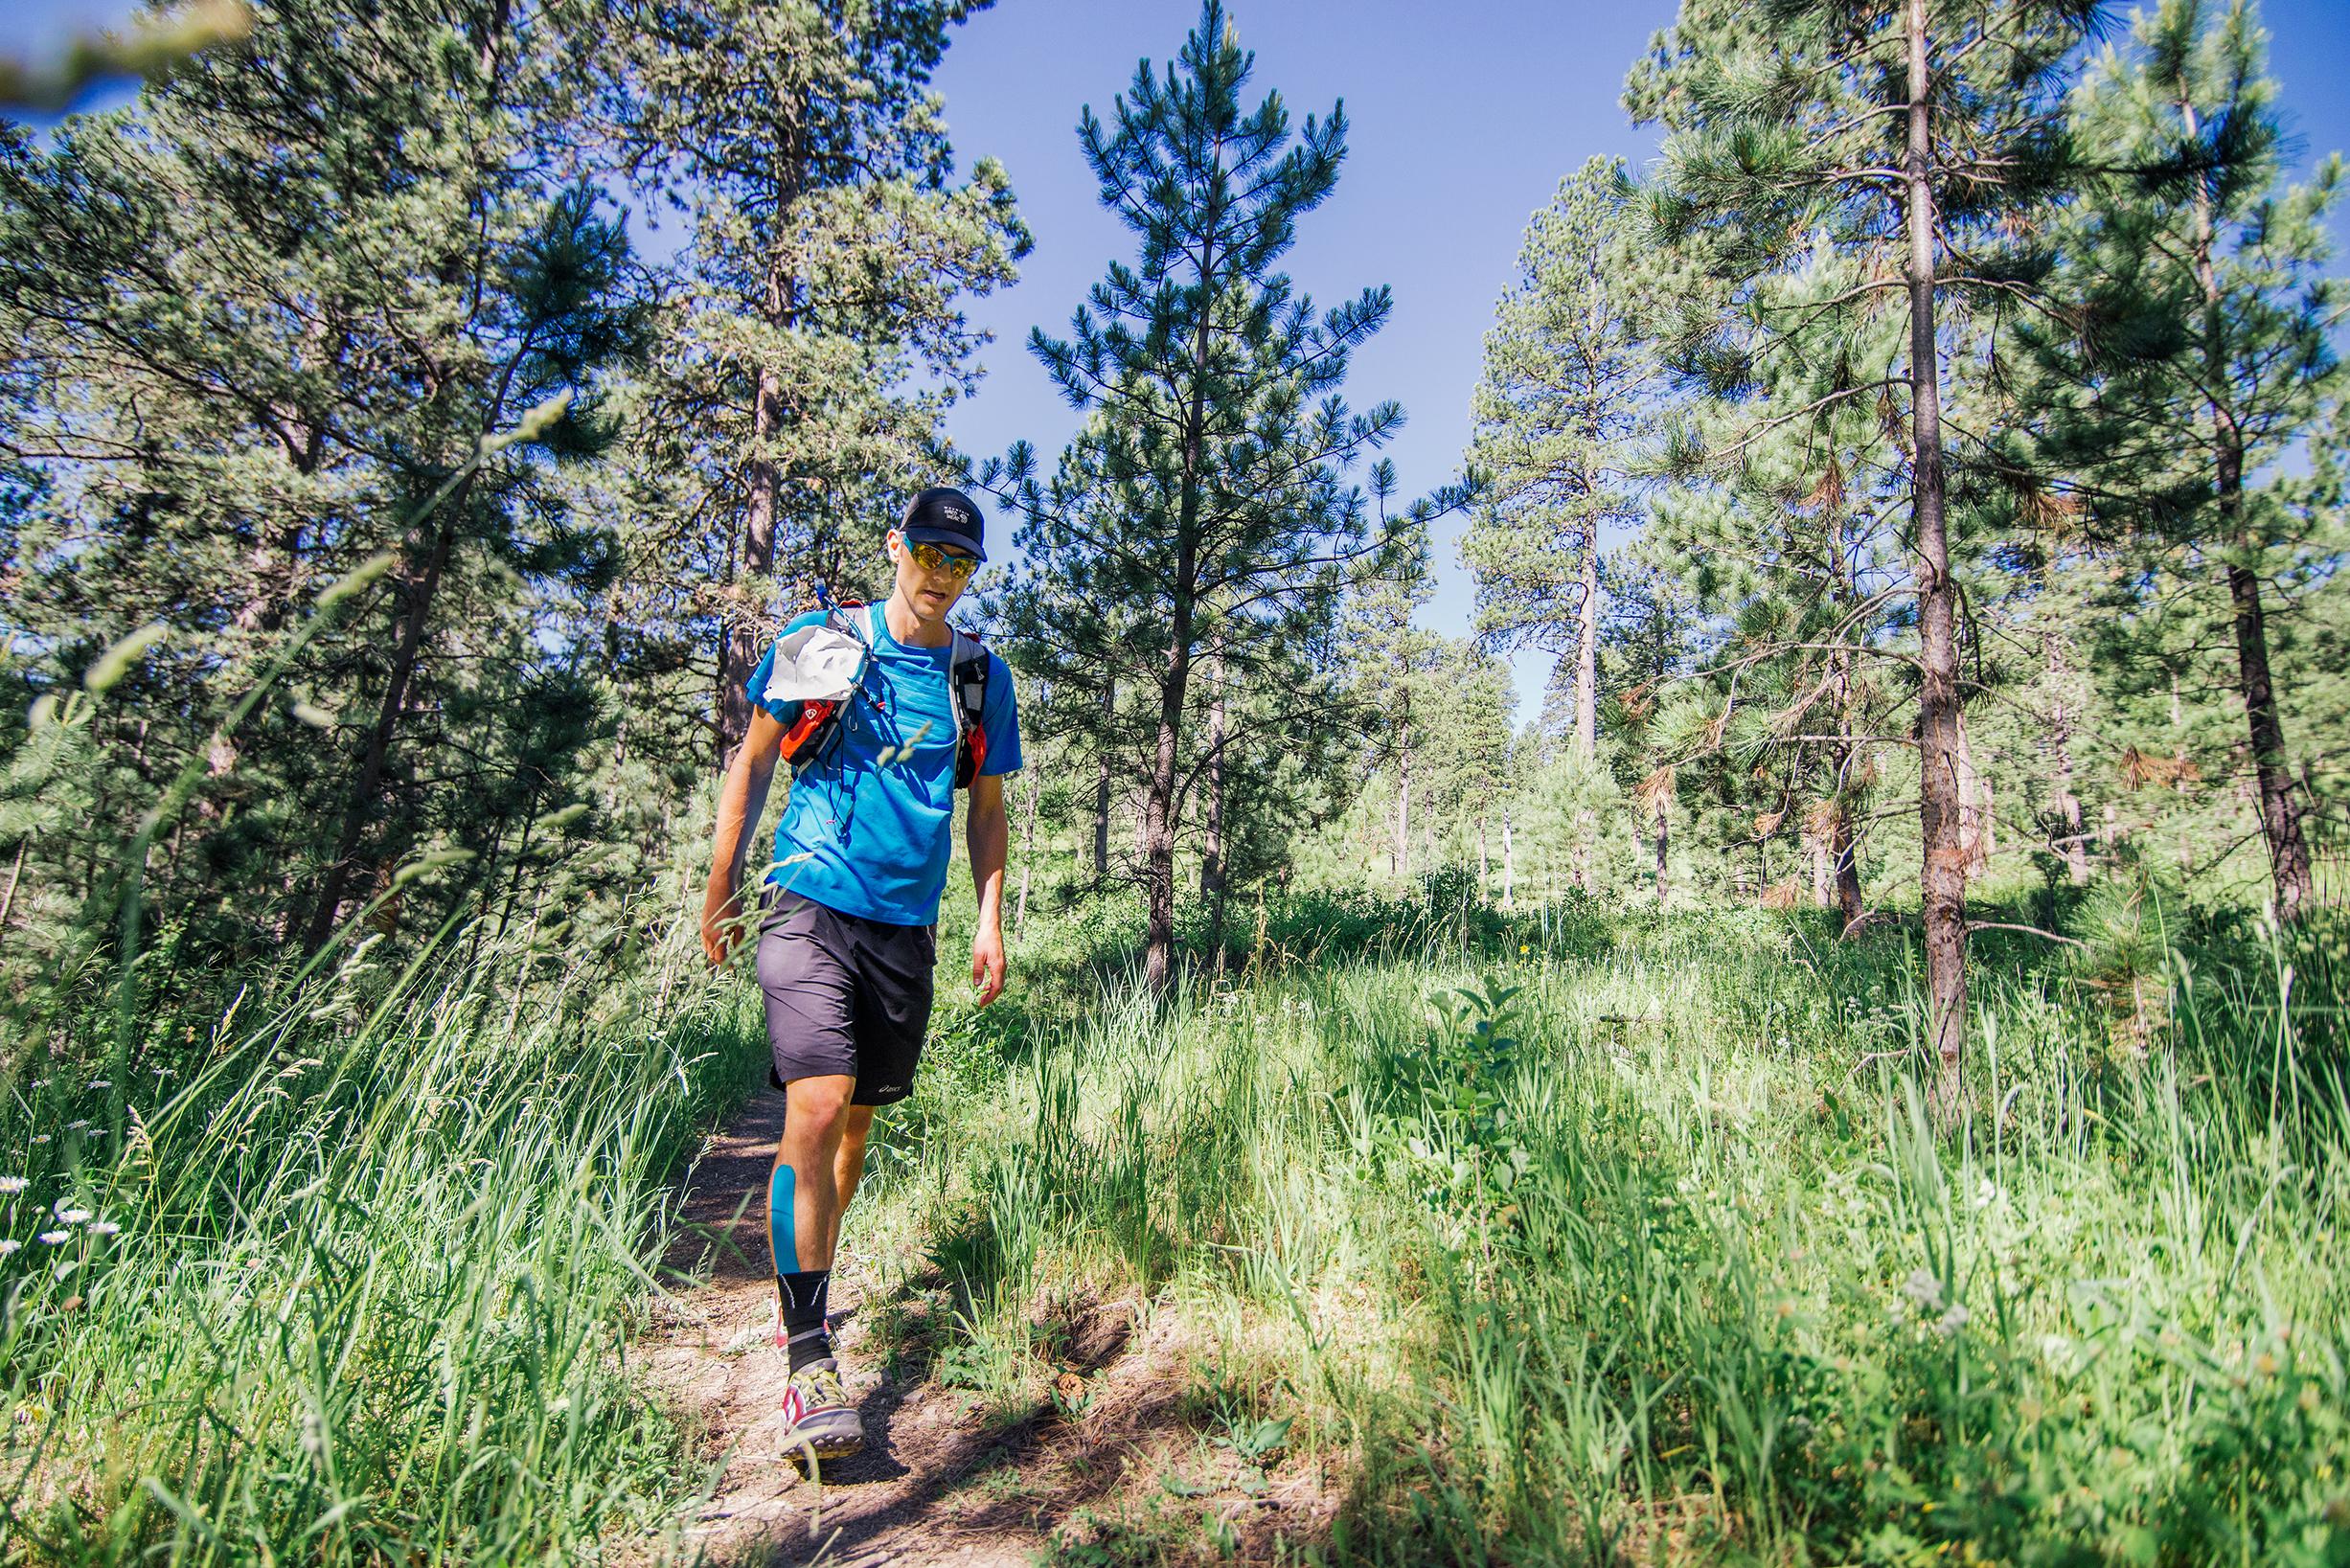 Black Hills 100 Mile Race